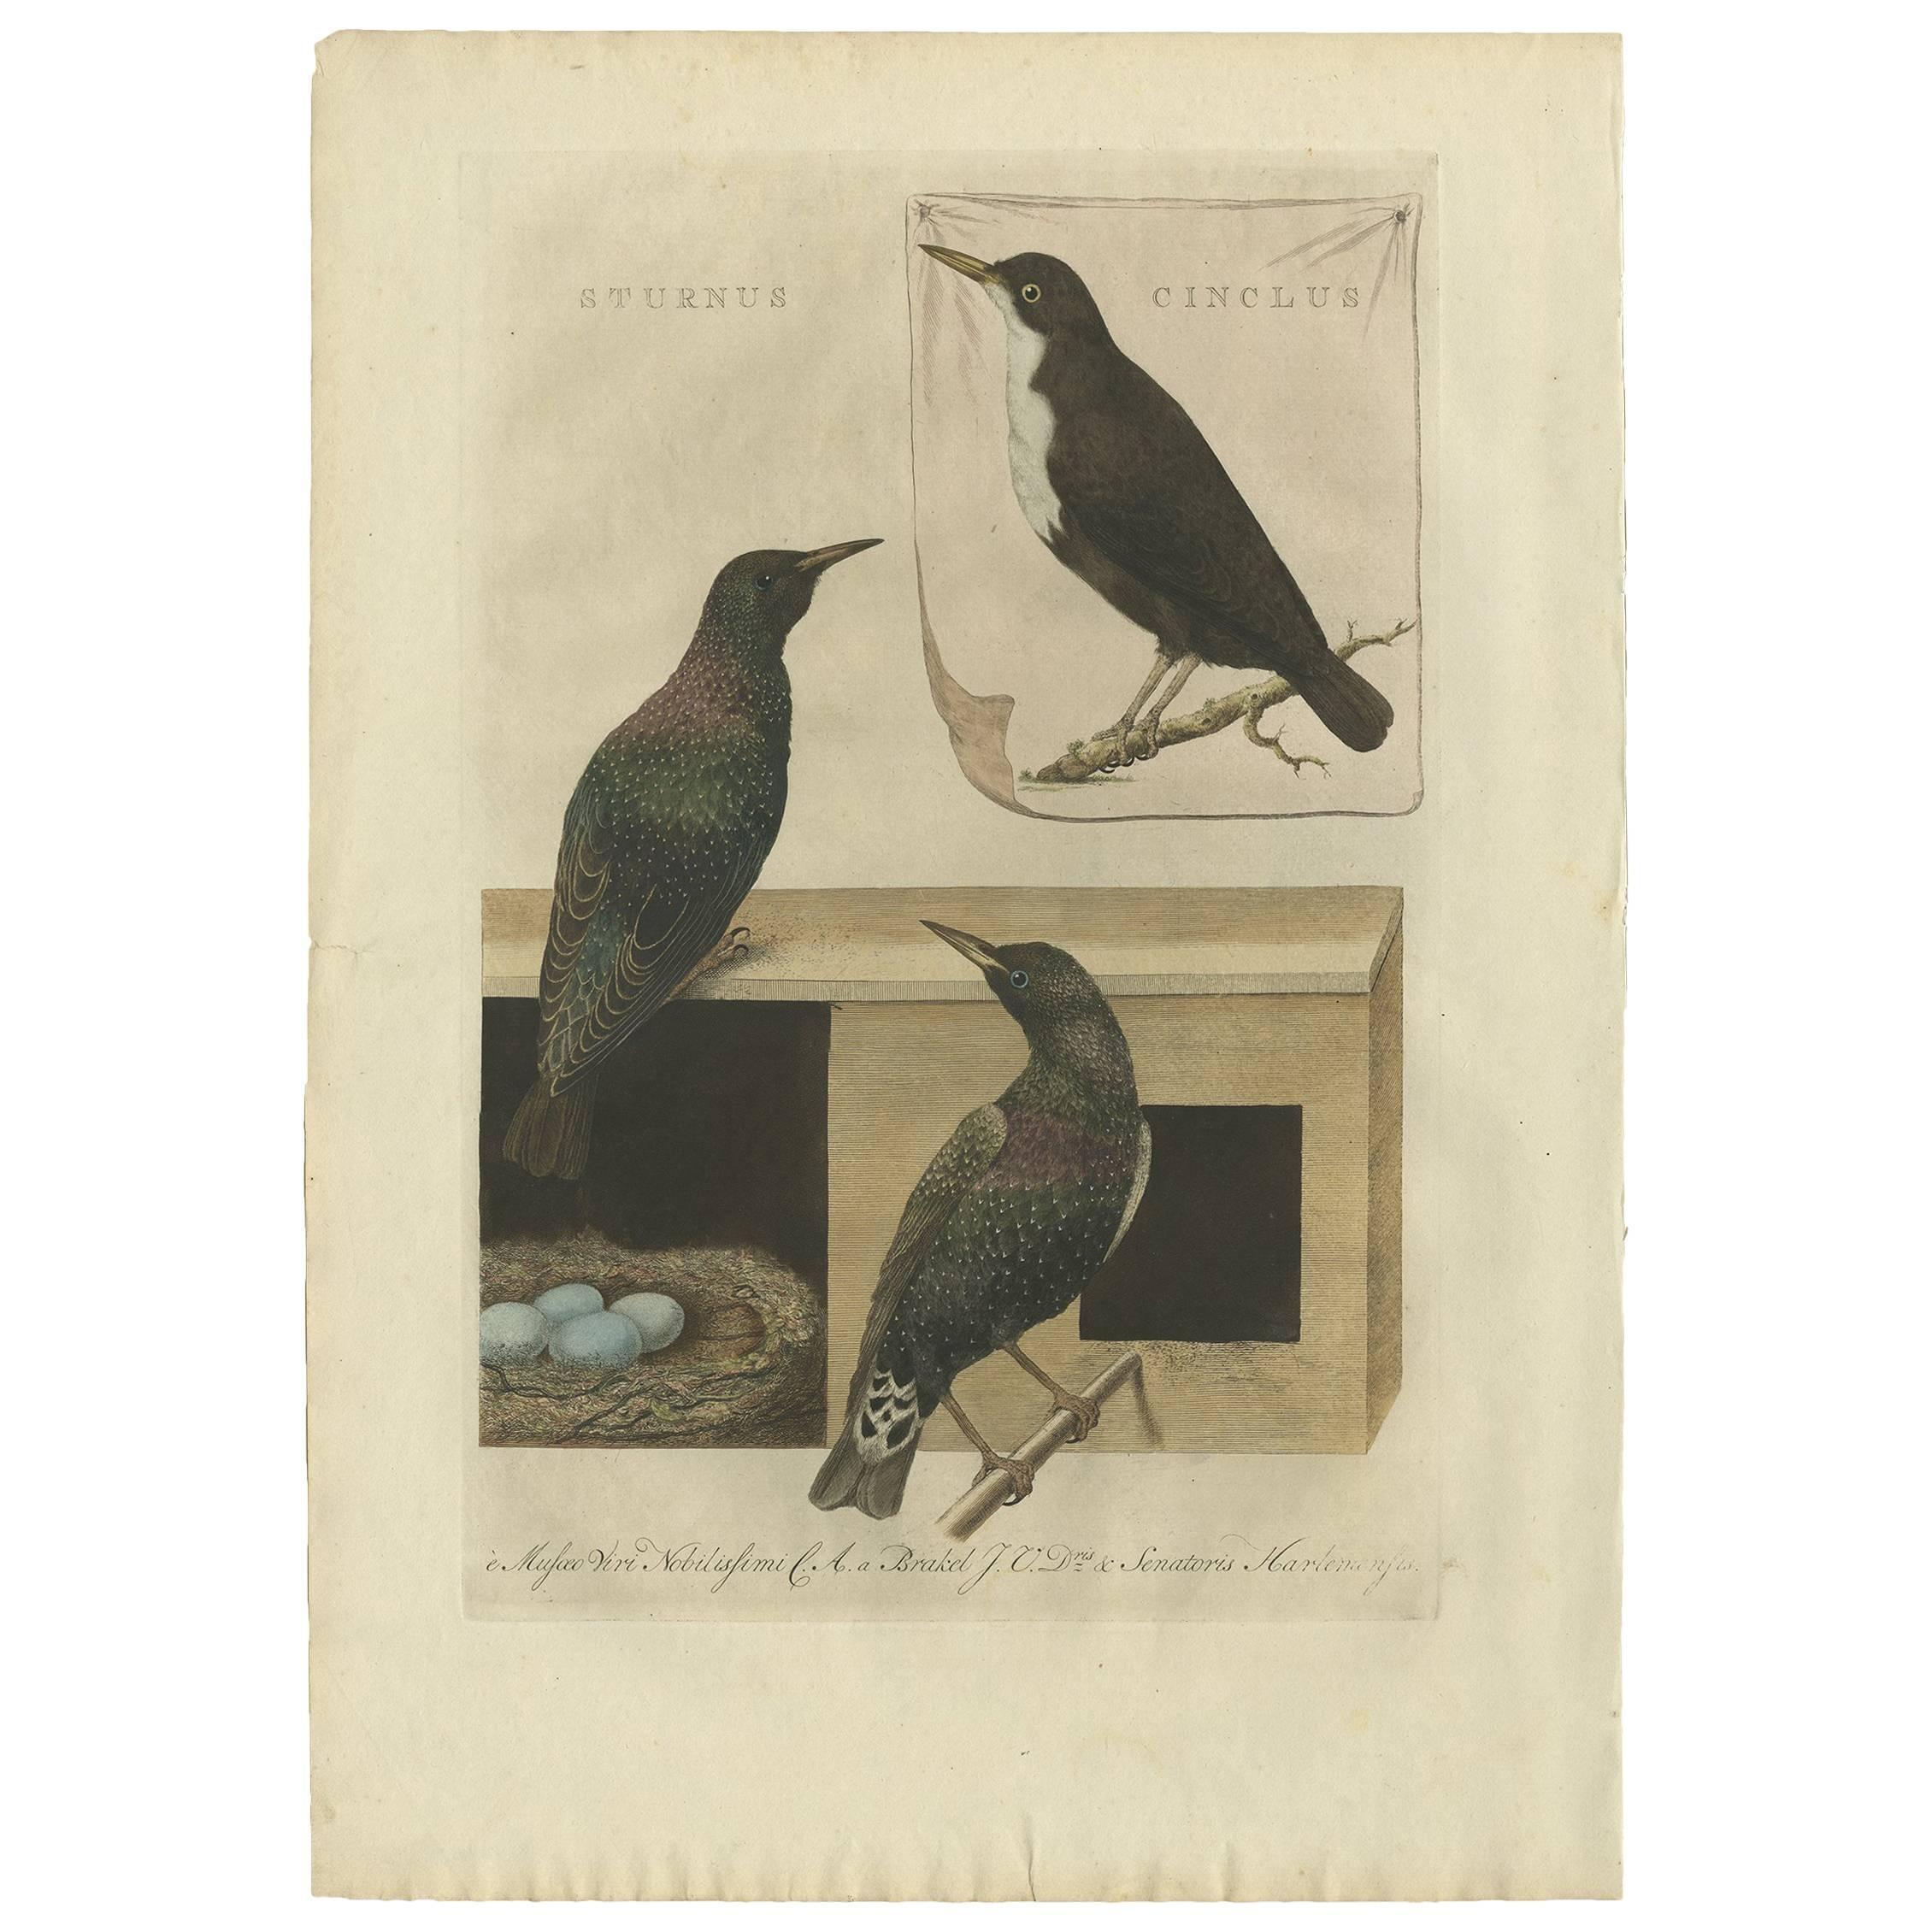 Antique Print of Starling Birds by Sepp & Nozeman, 1770